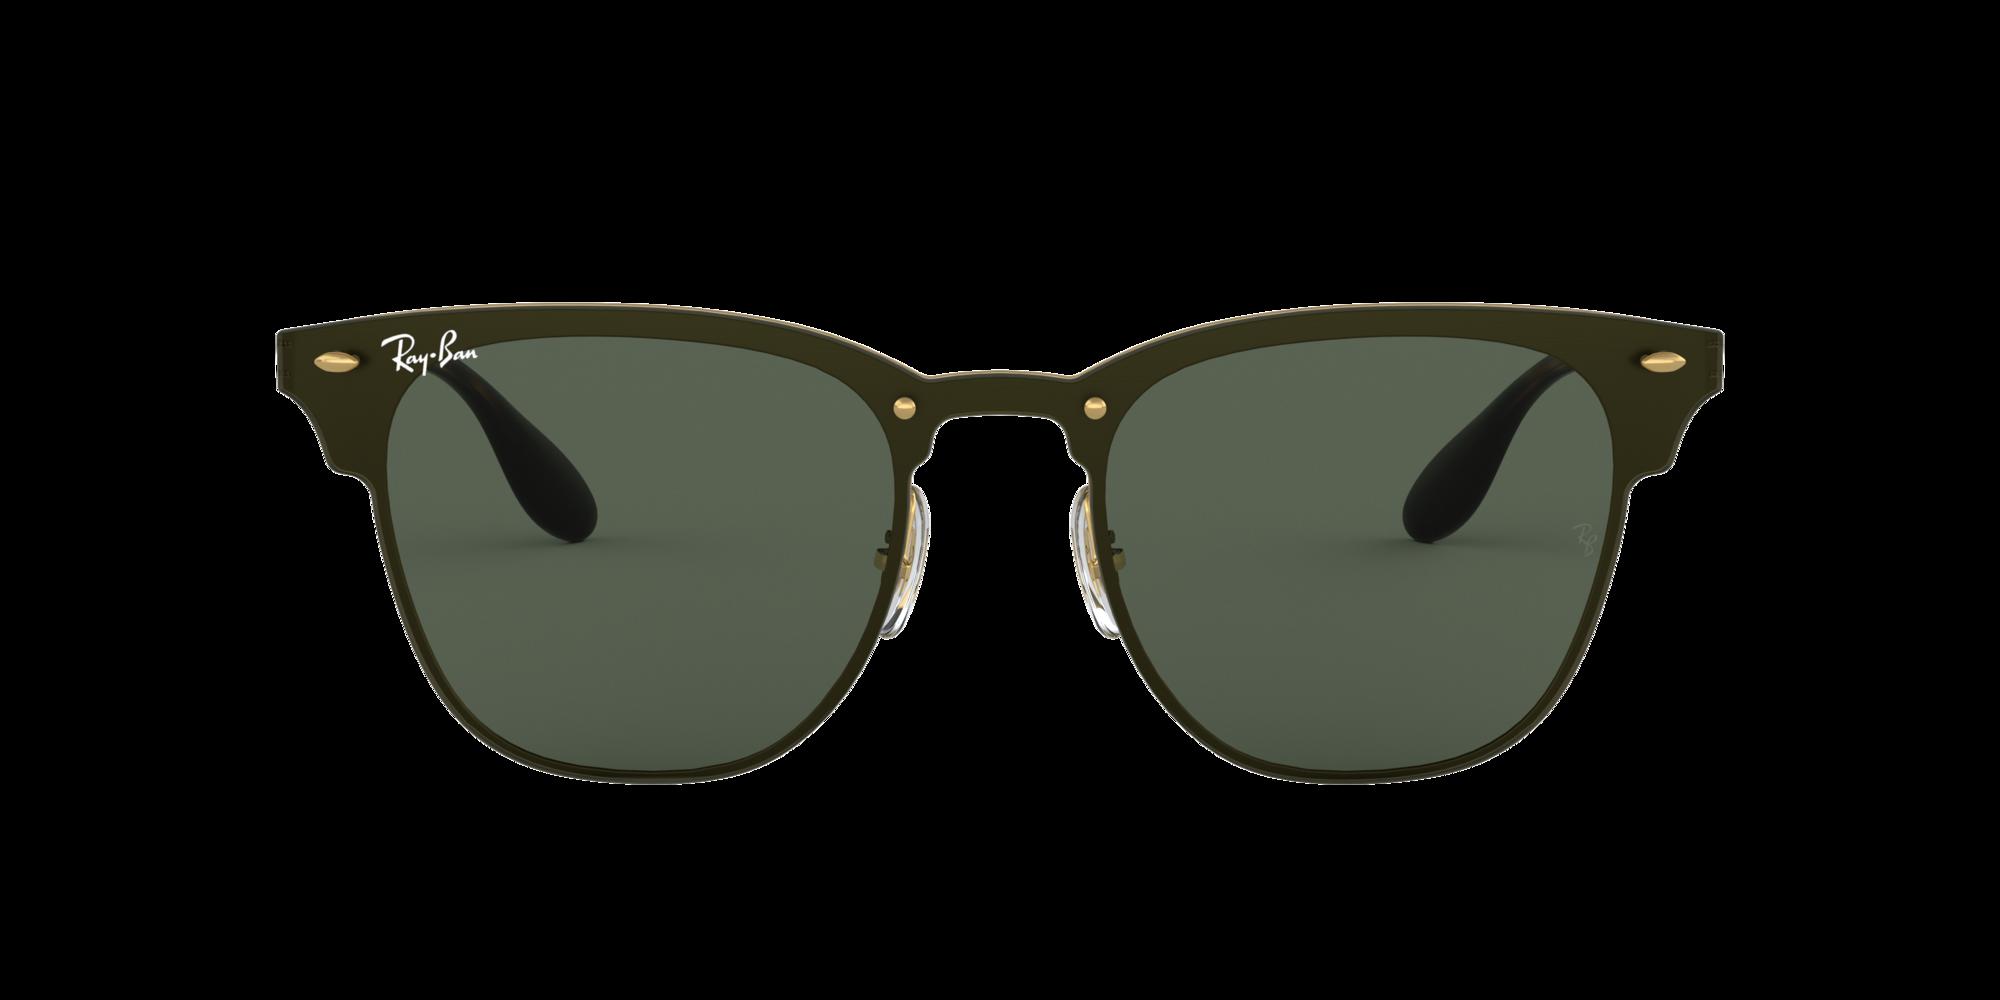 Image for RB3576N 47 BLAZE CLUBMASTER from LensCrafters   Glasses, Prescription Glasses Online, Eyewear